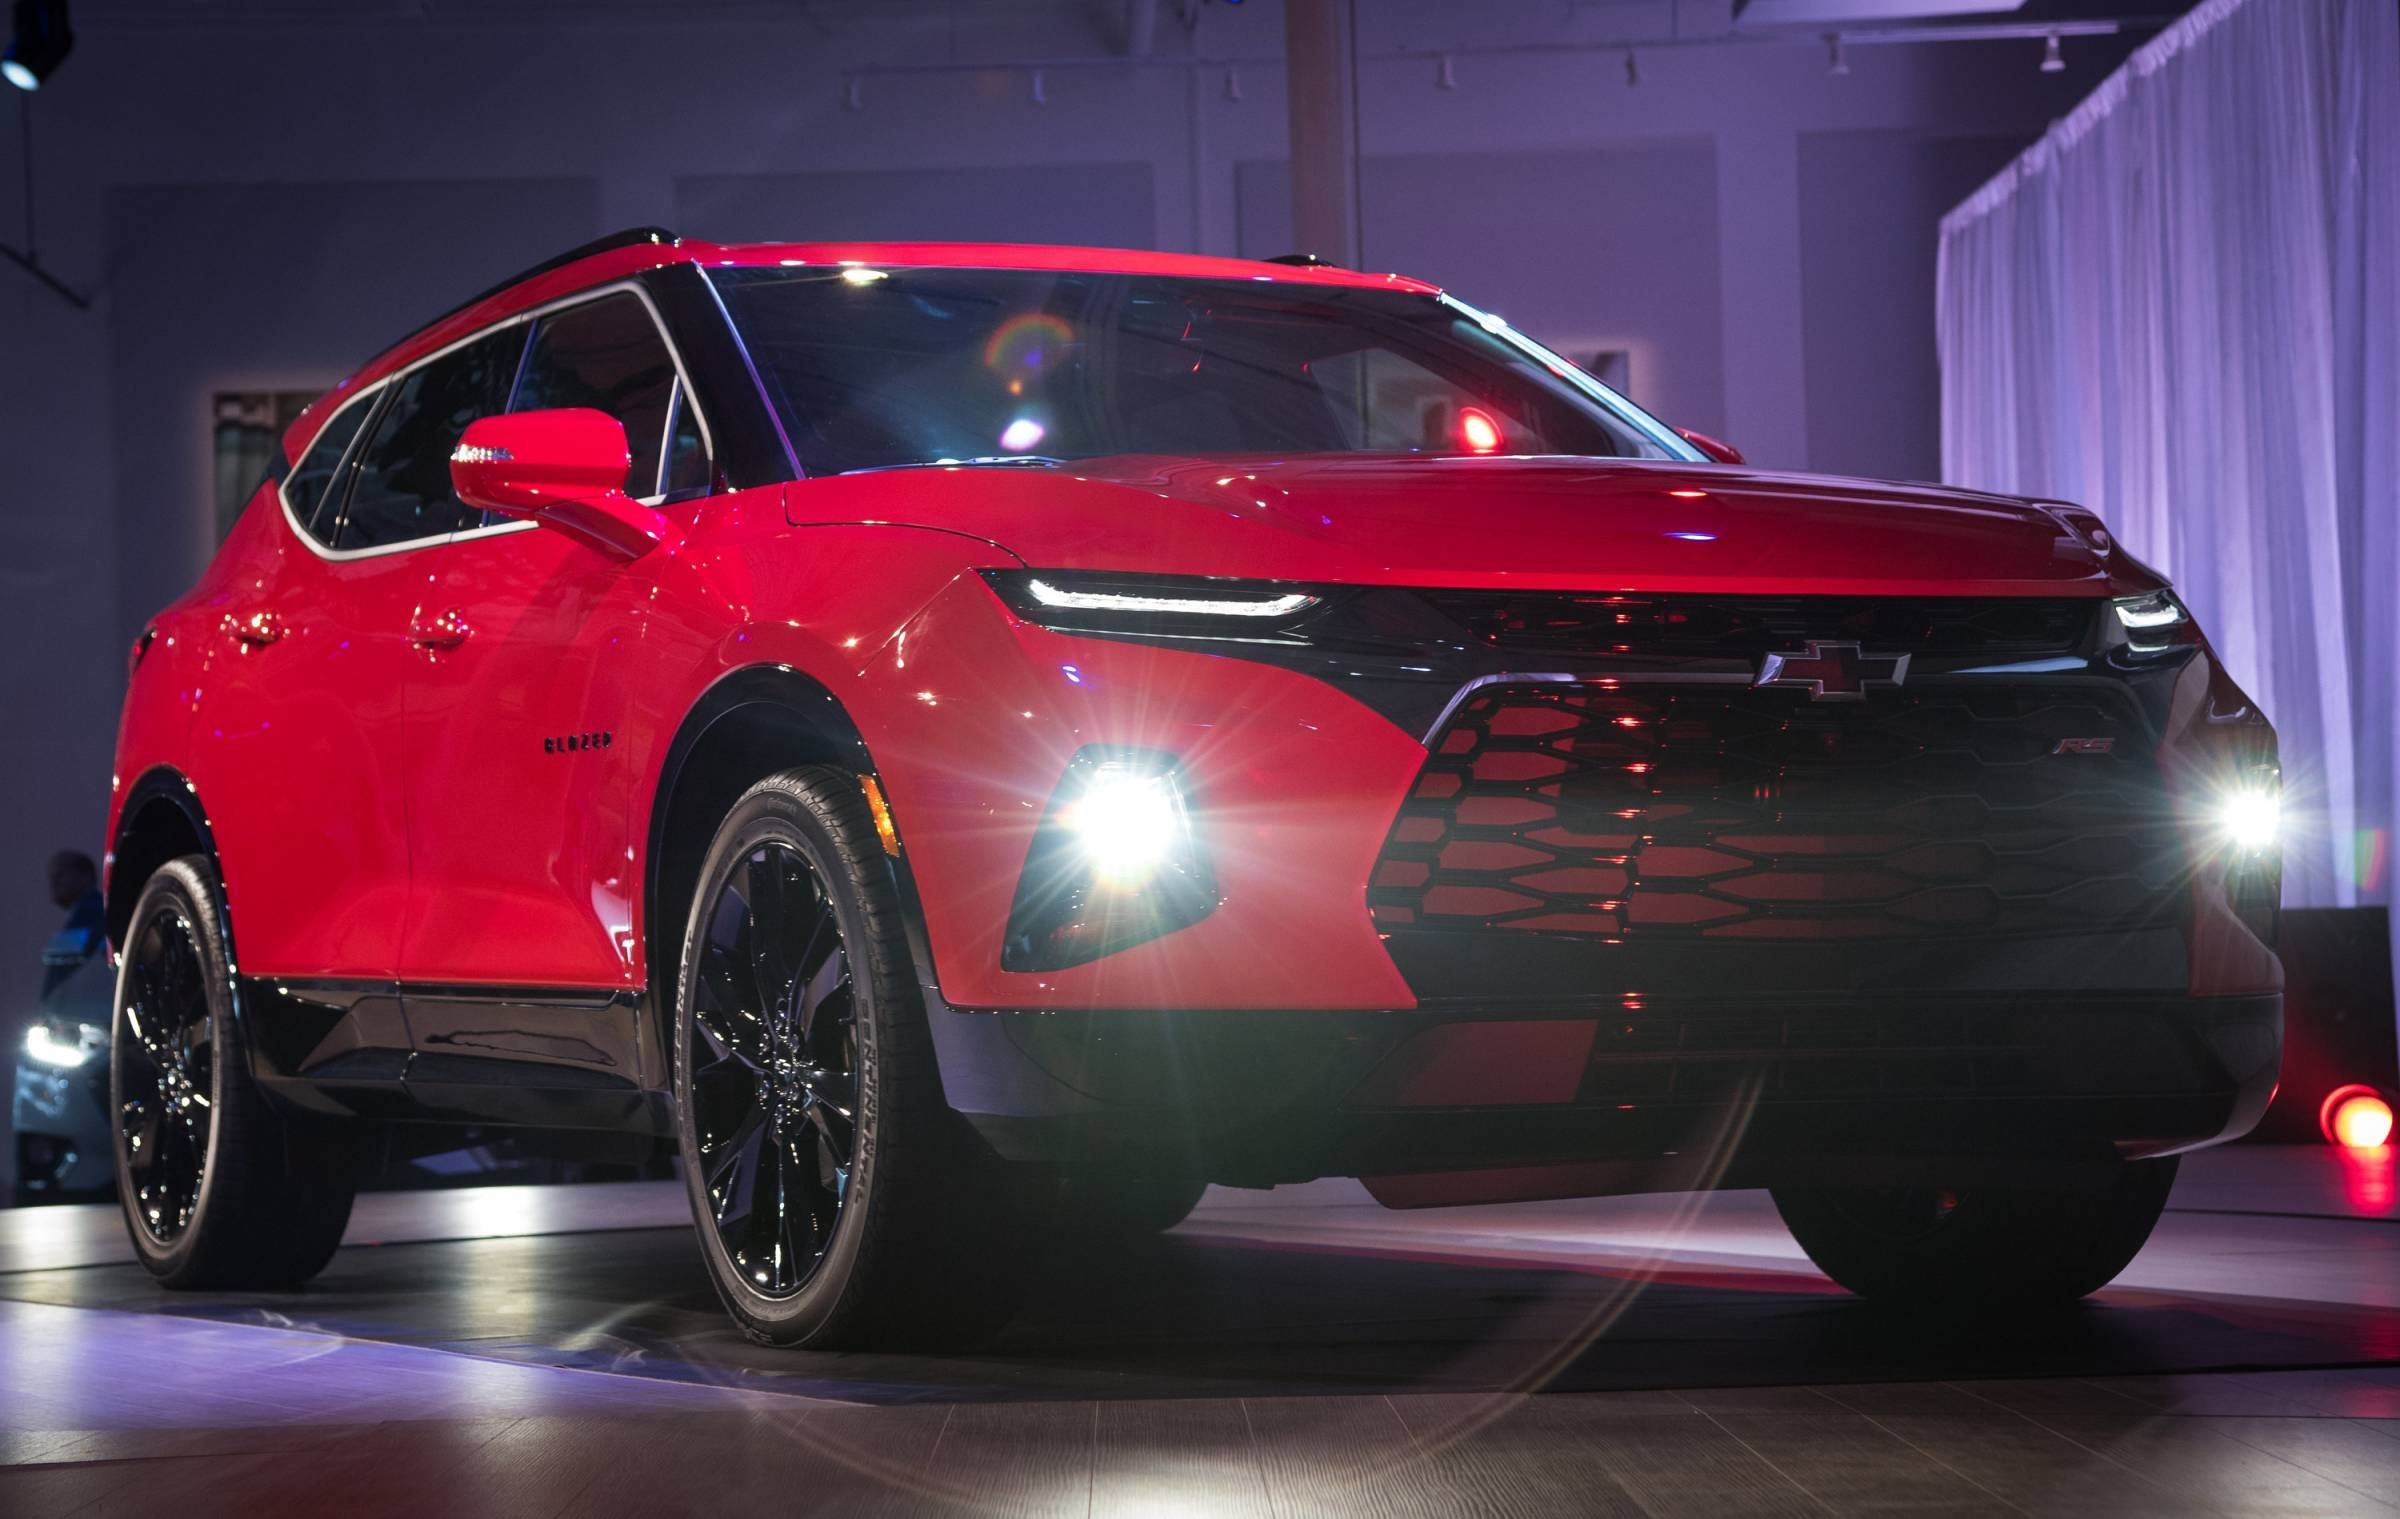 2021 Lexus Rx 350 F Sport Suv New Concept In 2020 Chevrolet Blazer Chevrolet Trailblazer Chevrolet